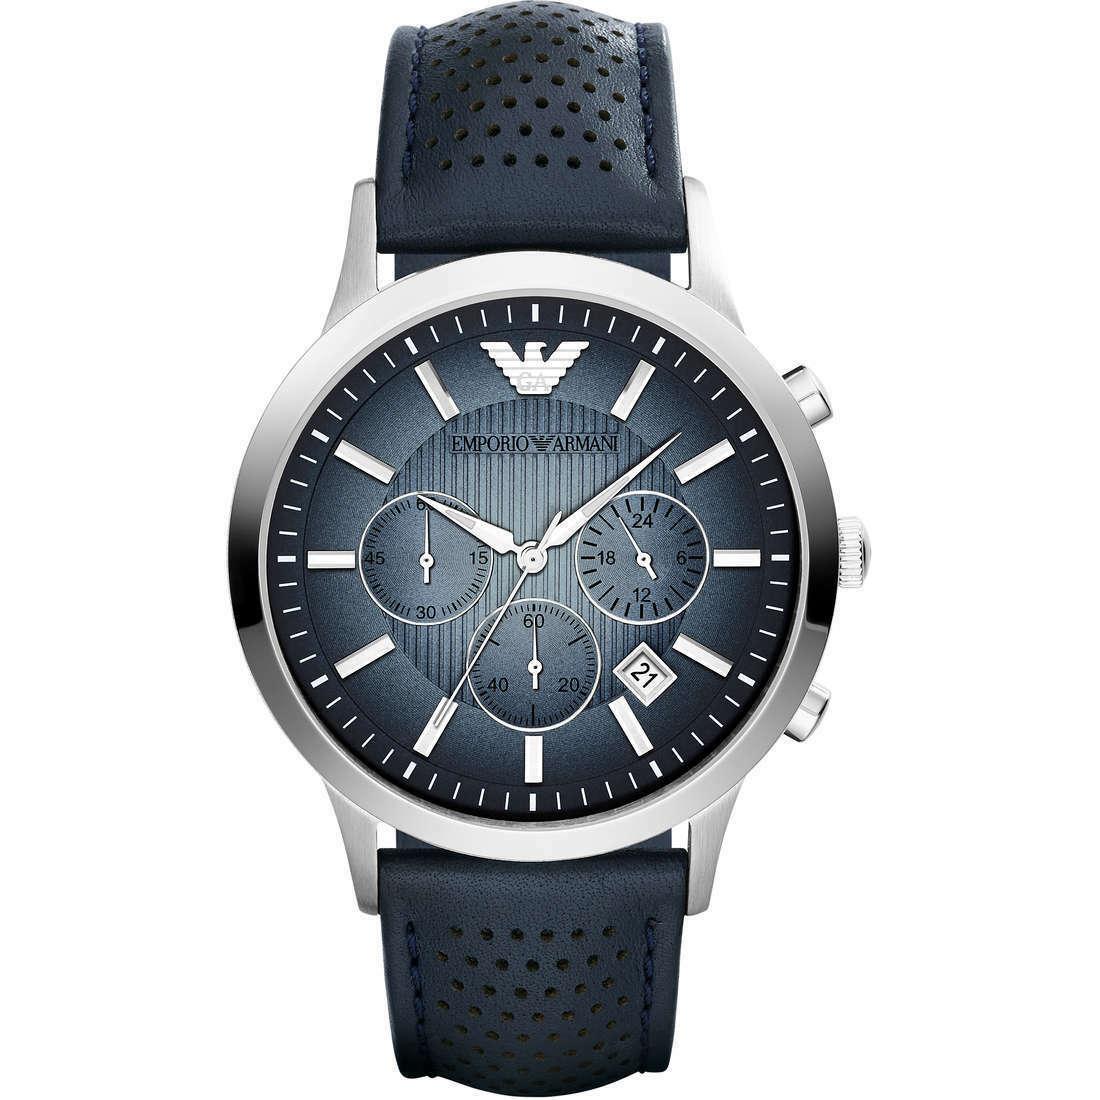 Emporio Armani Cronografo Uomo 91.67€